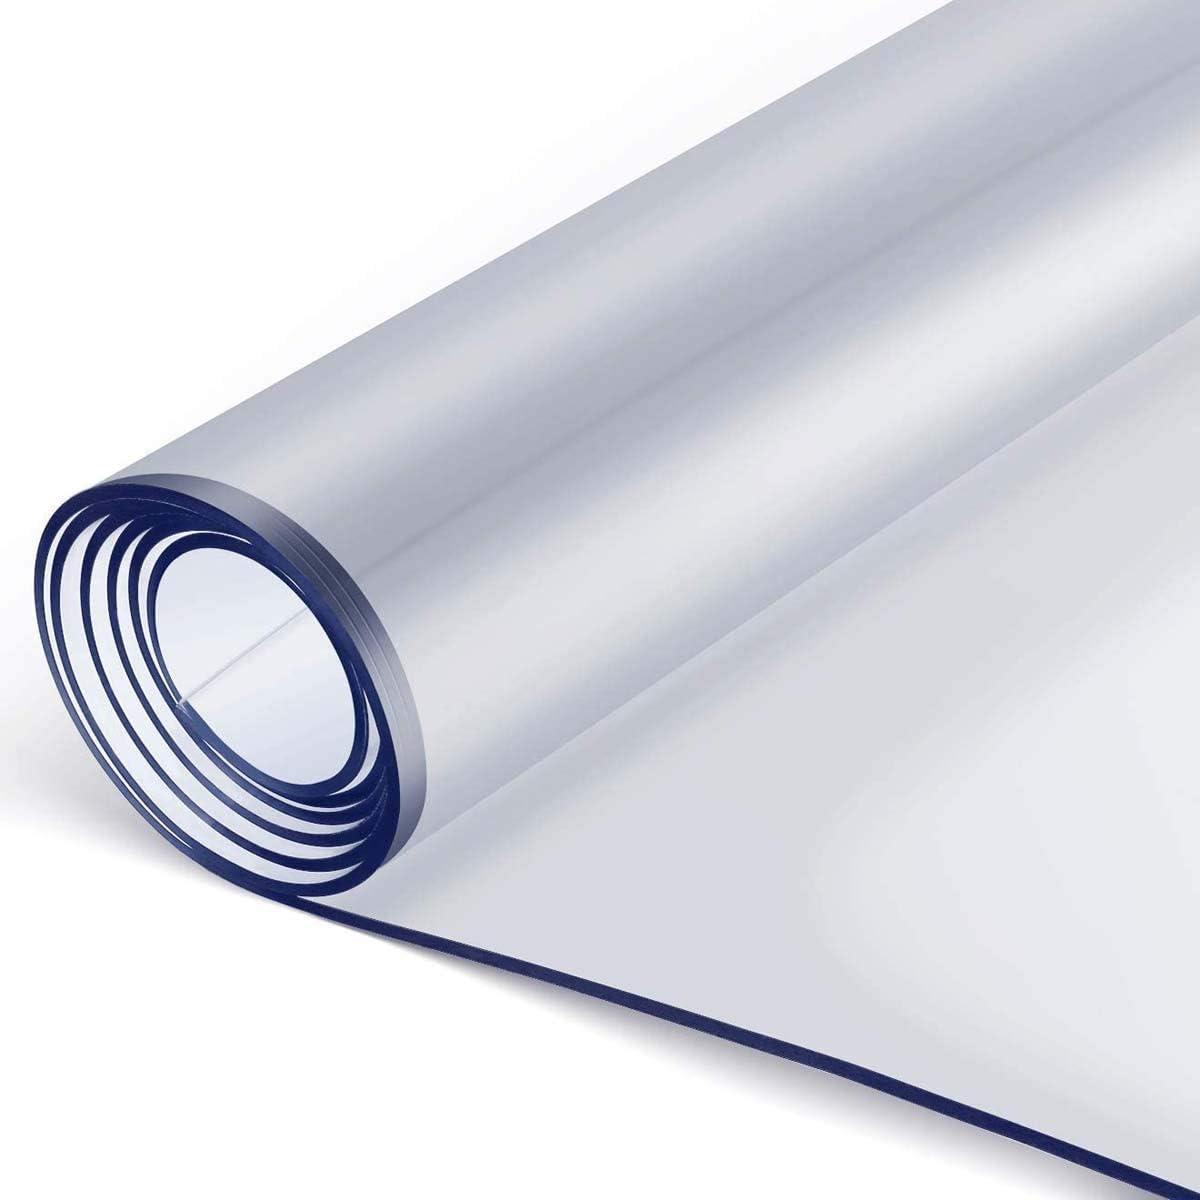 XIGG Clear Plastic Transparent Clea Over item Fresno Mall handling Custom Protector Tablecloth